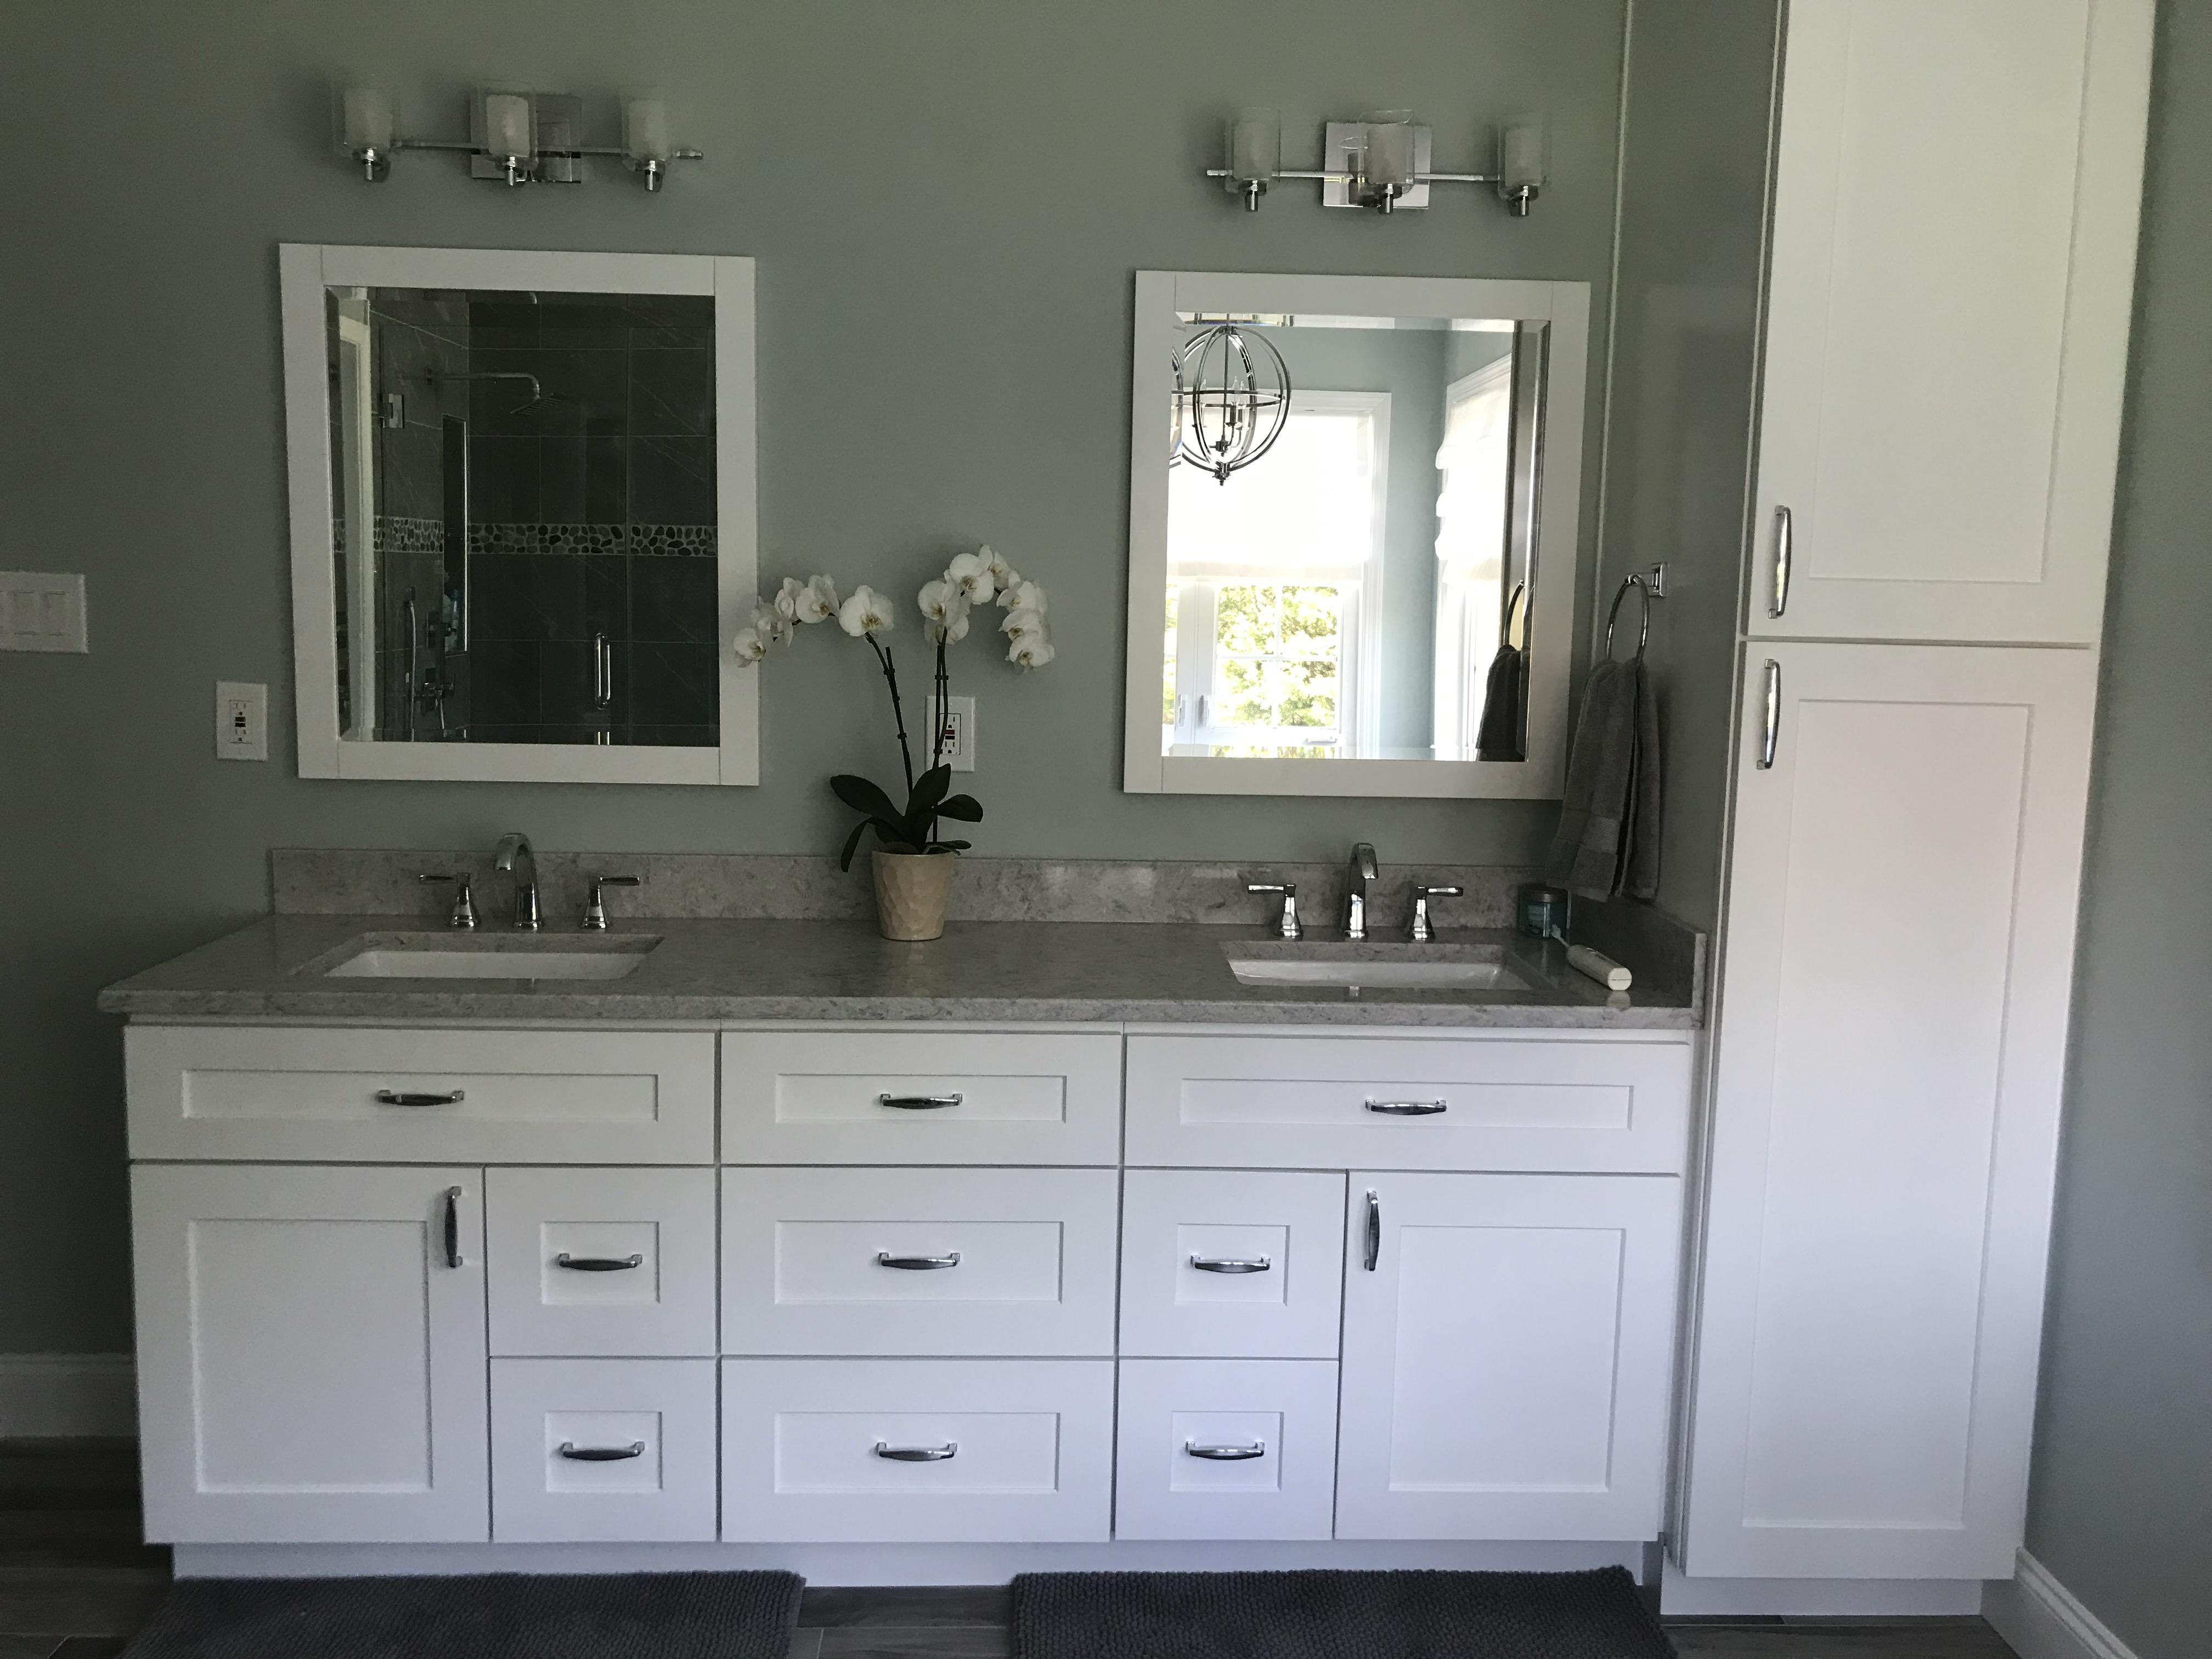 Blackstone Kitchen Bath Reviews Glenwood Md Angi